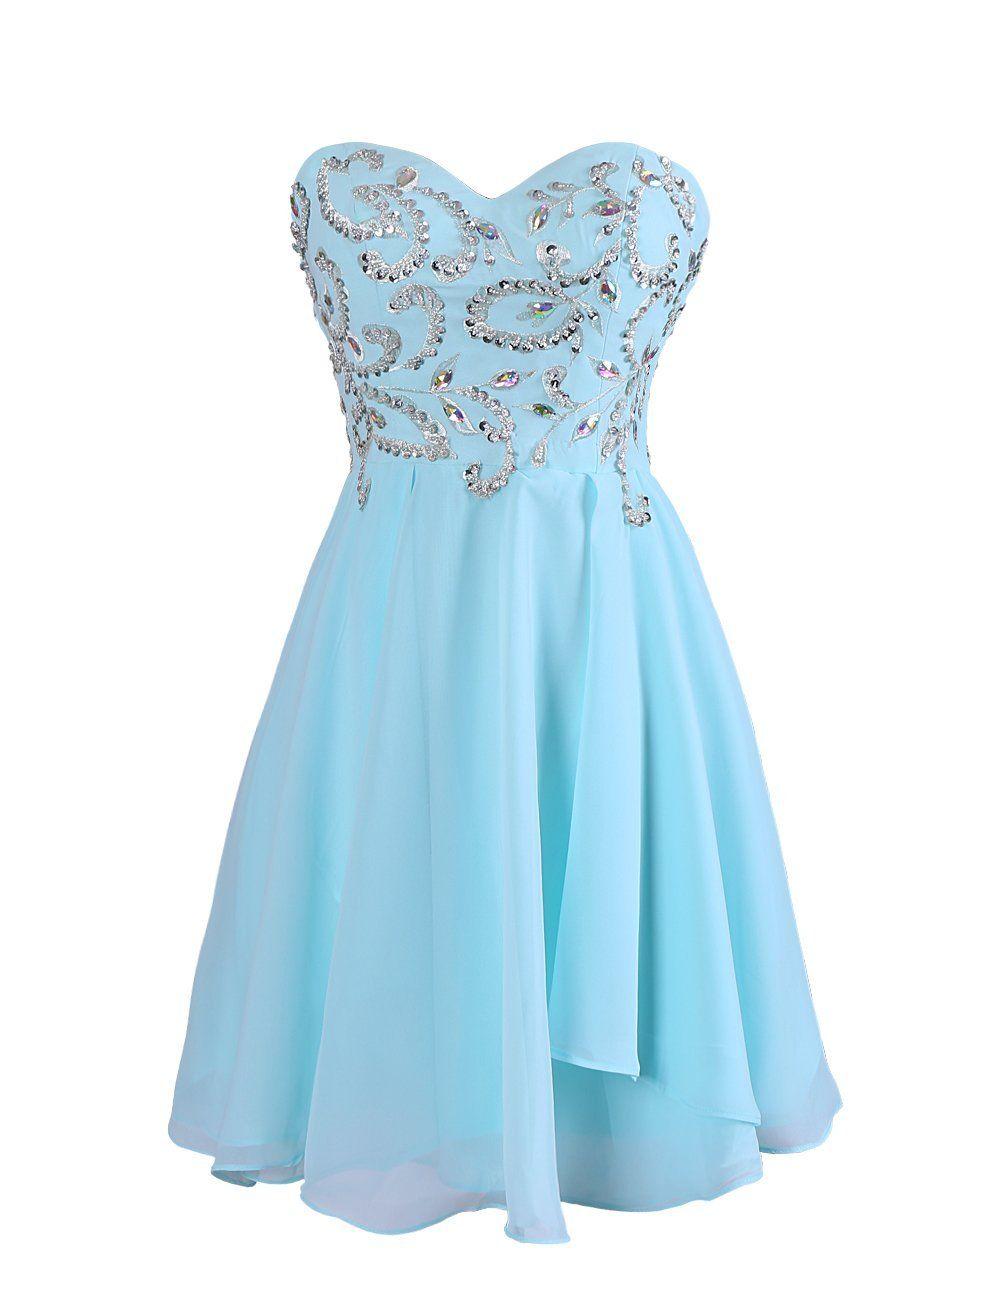 Simple A-line Sweetheart Knee Length Chiffon Prom/Homecoming Dress ...